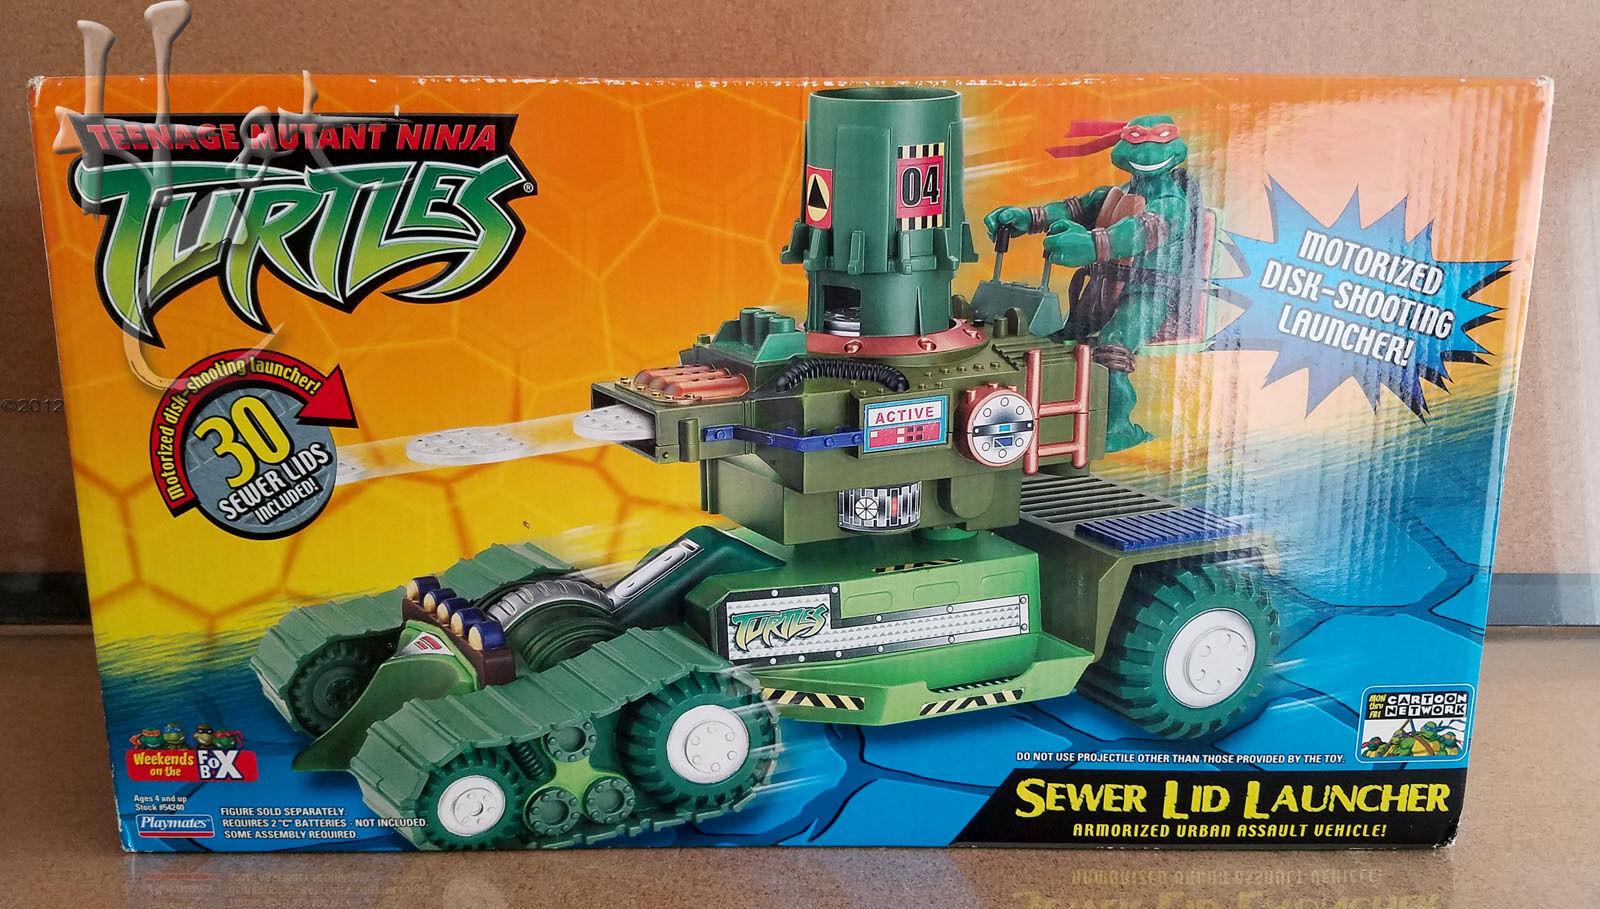 Tmnt kanalisation deckel raketenwerfer armorized angriff fahrzeug 2004 besiegelte ninja turtles